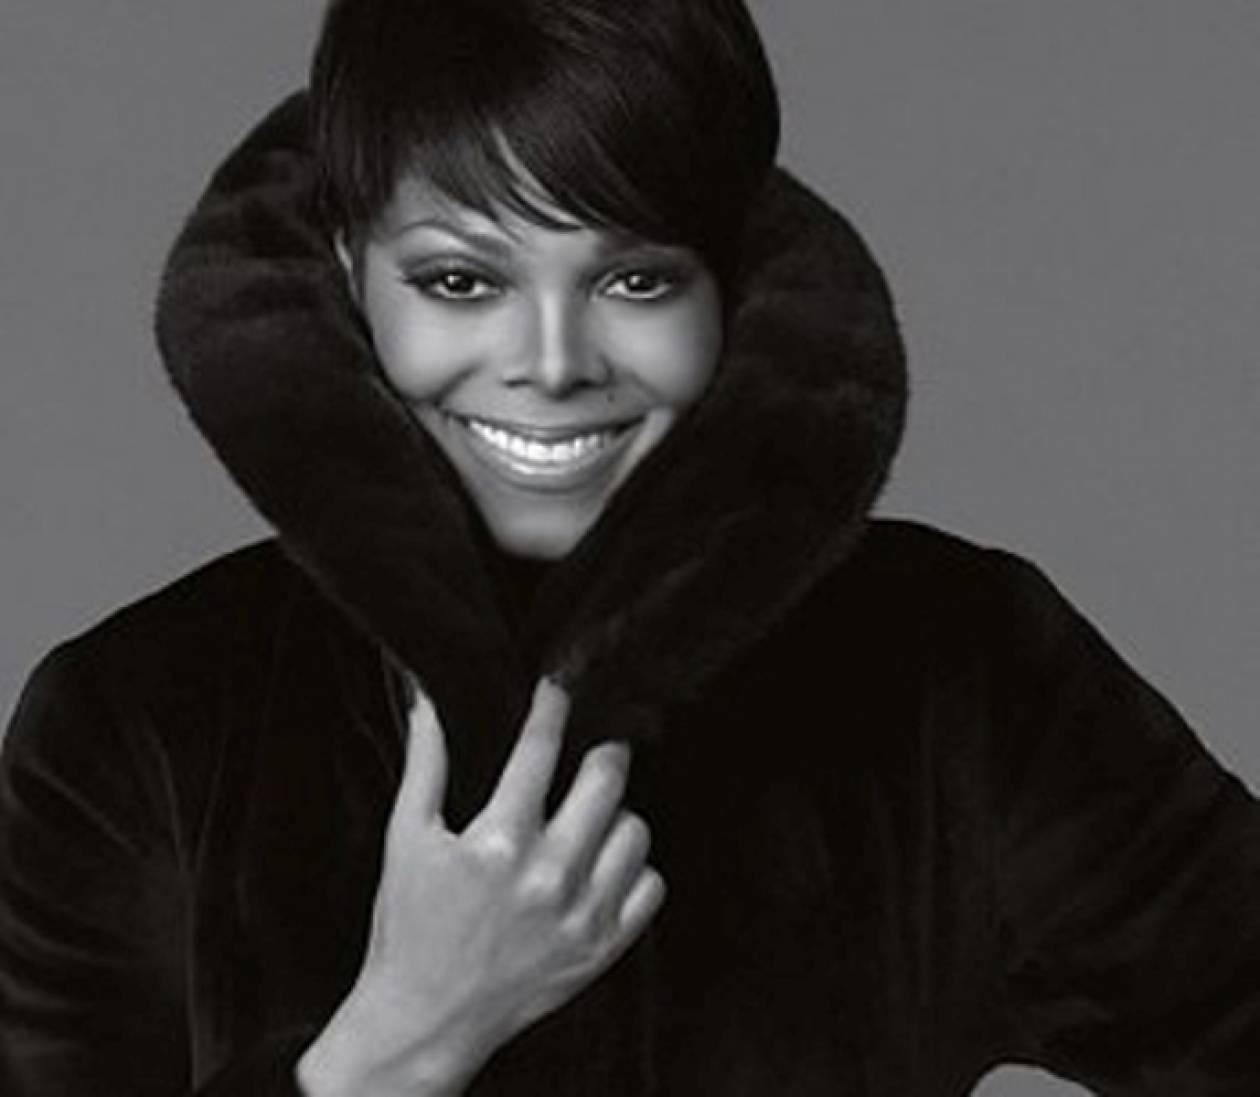 H Janet Jackson σχεδιάζει γούνες